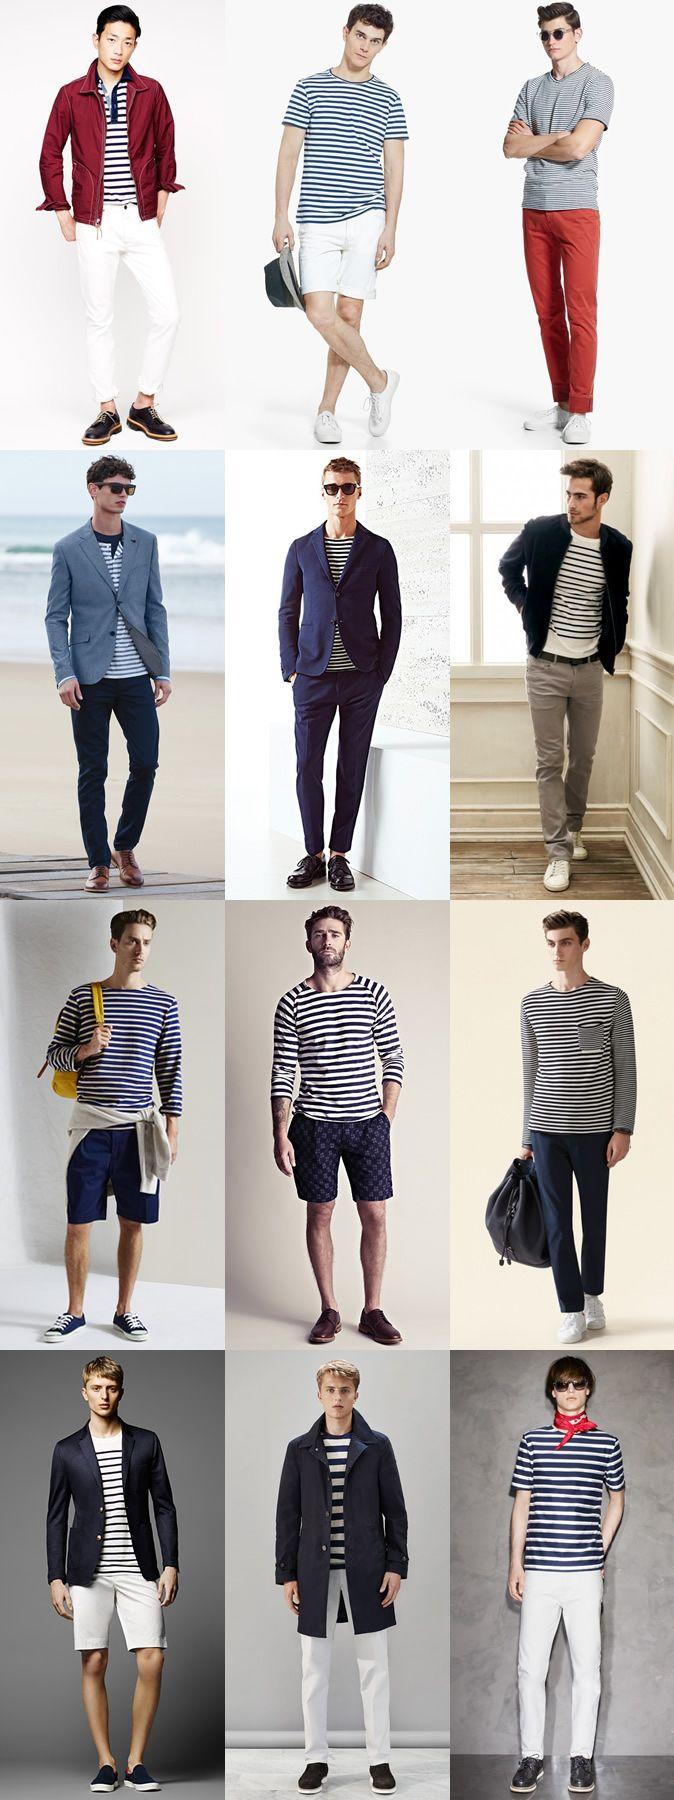 Men's Summer Nautical Style: Breton Stripe T-Shirts and ...